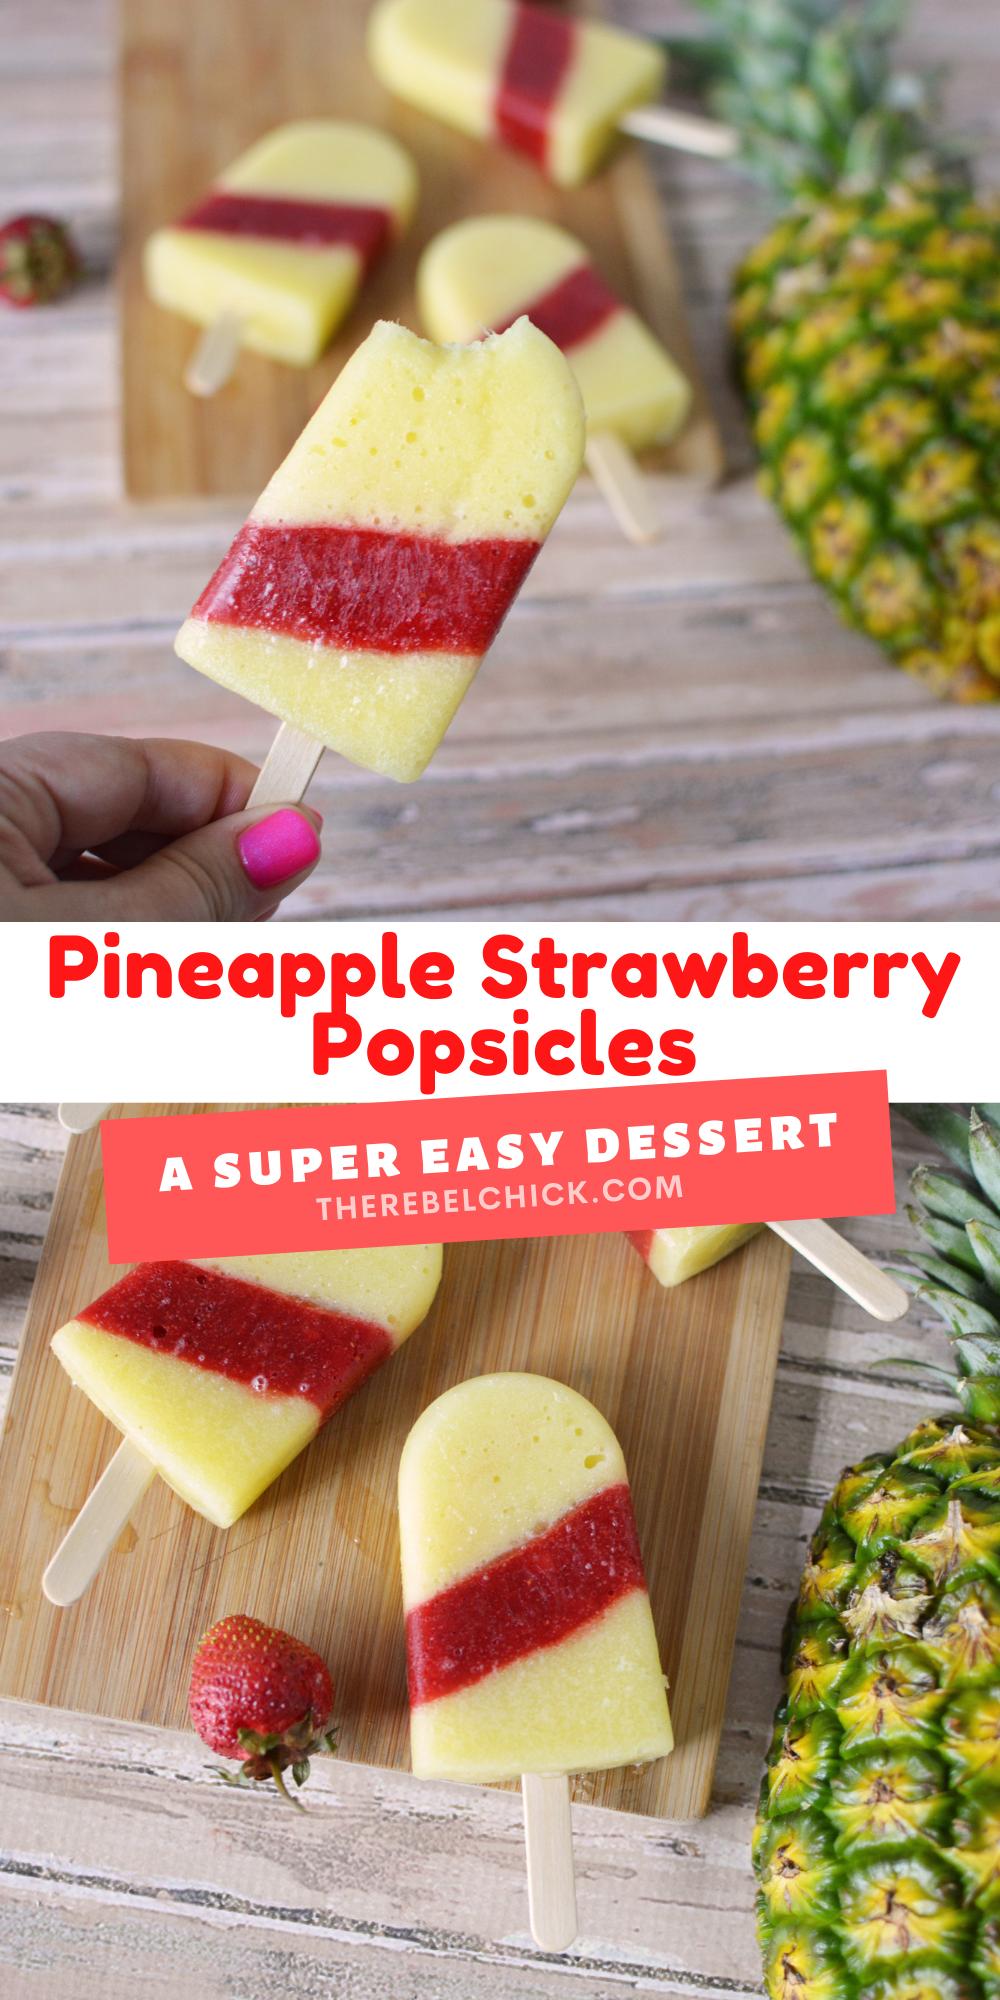 Pineapple Strawberry Popsicles Recipe